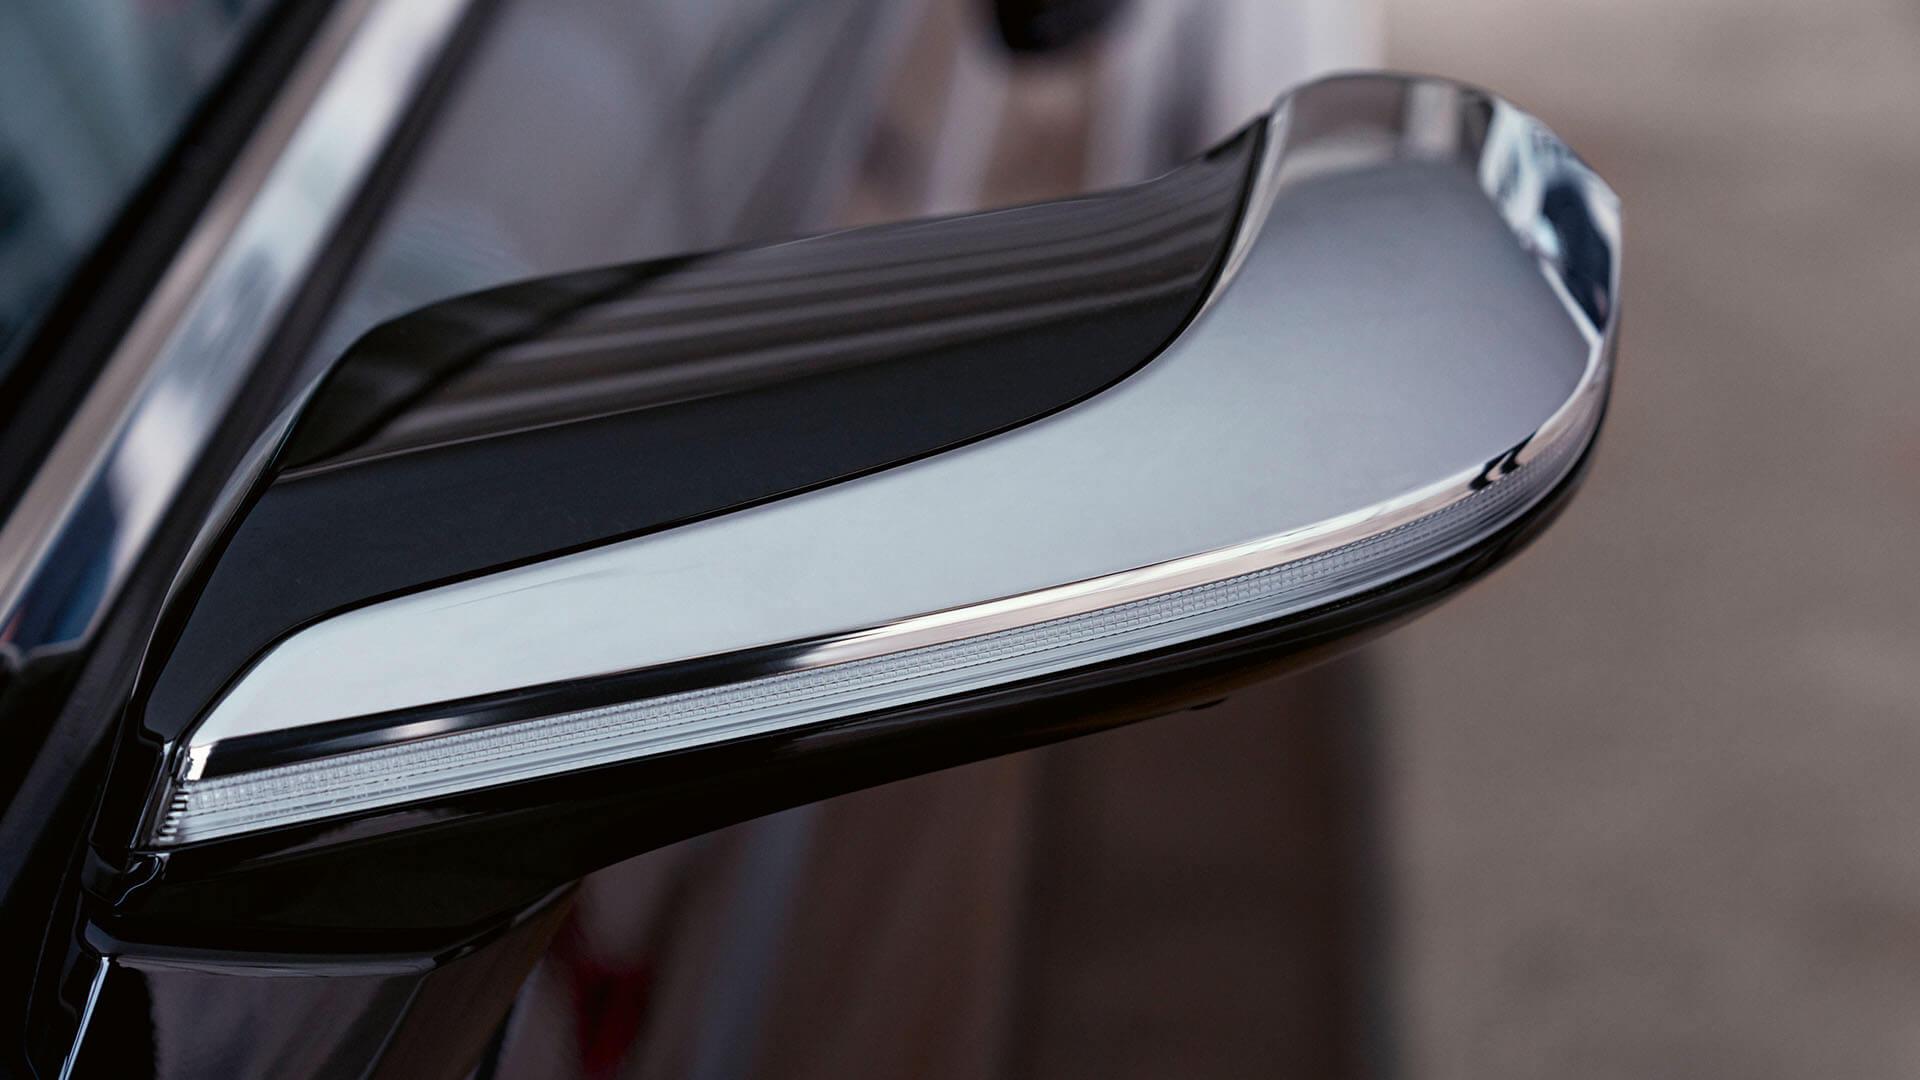 2022 lexus es experience exterior front digital side view monitors